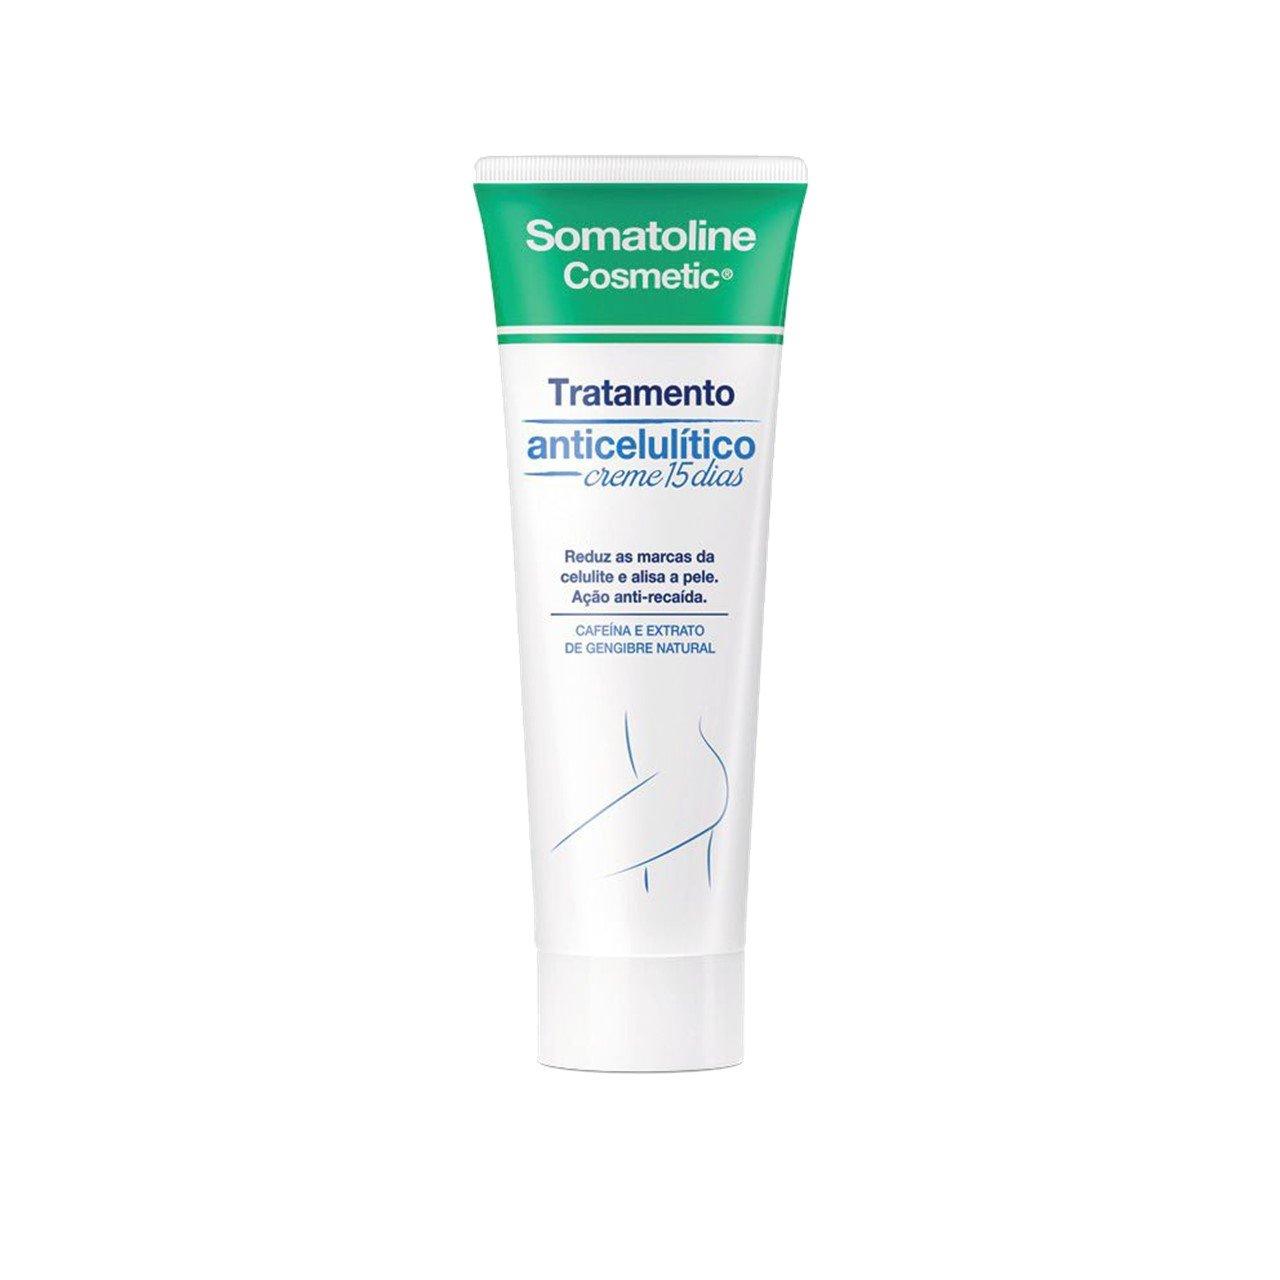 Somatoline Cosmetic Anti-Cellulite Treatment Cream 15 Days ...